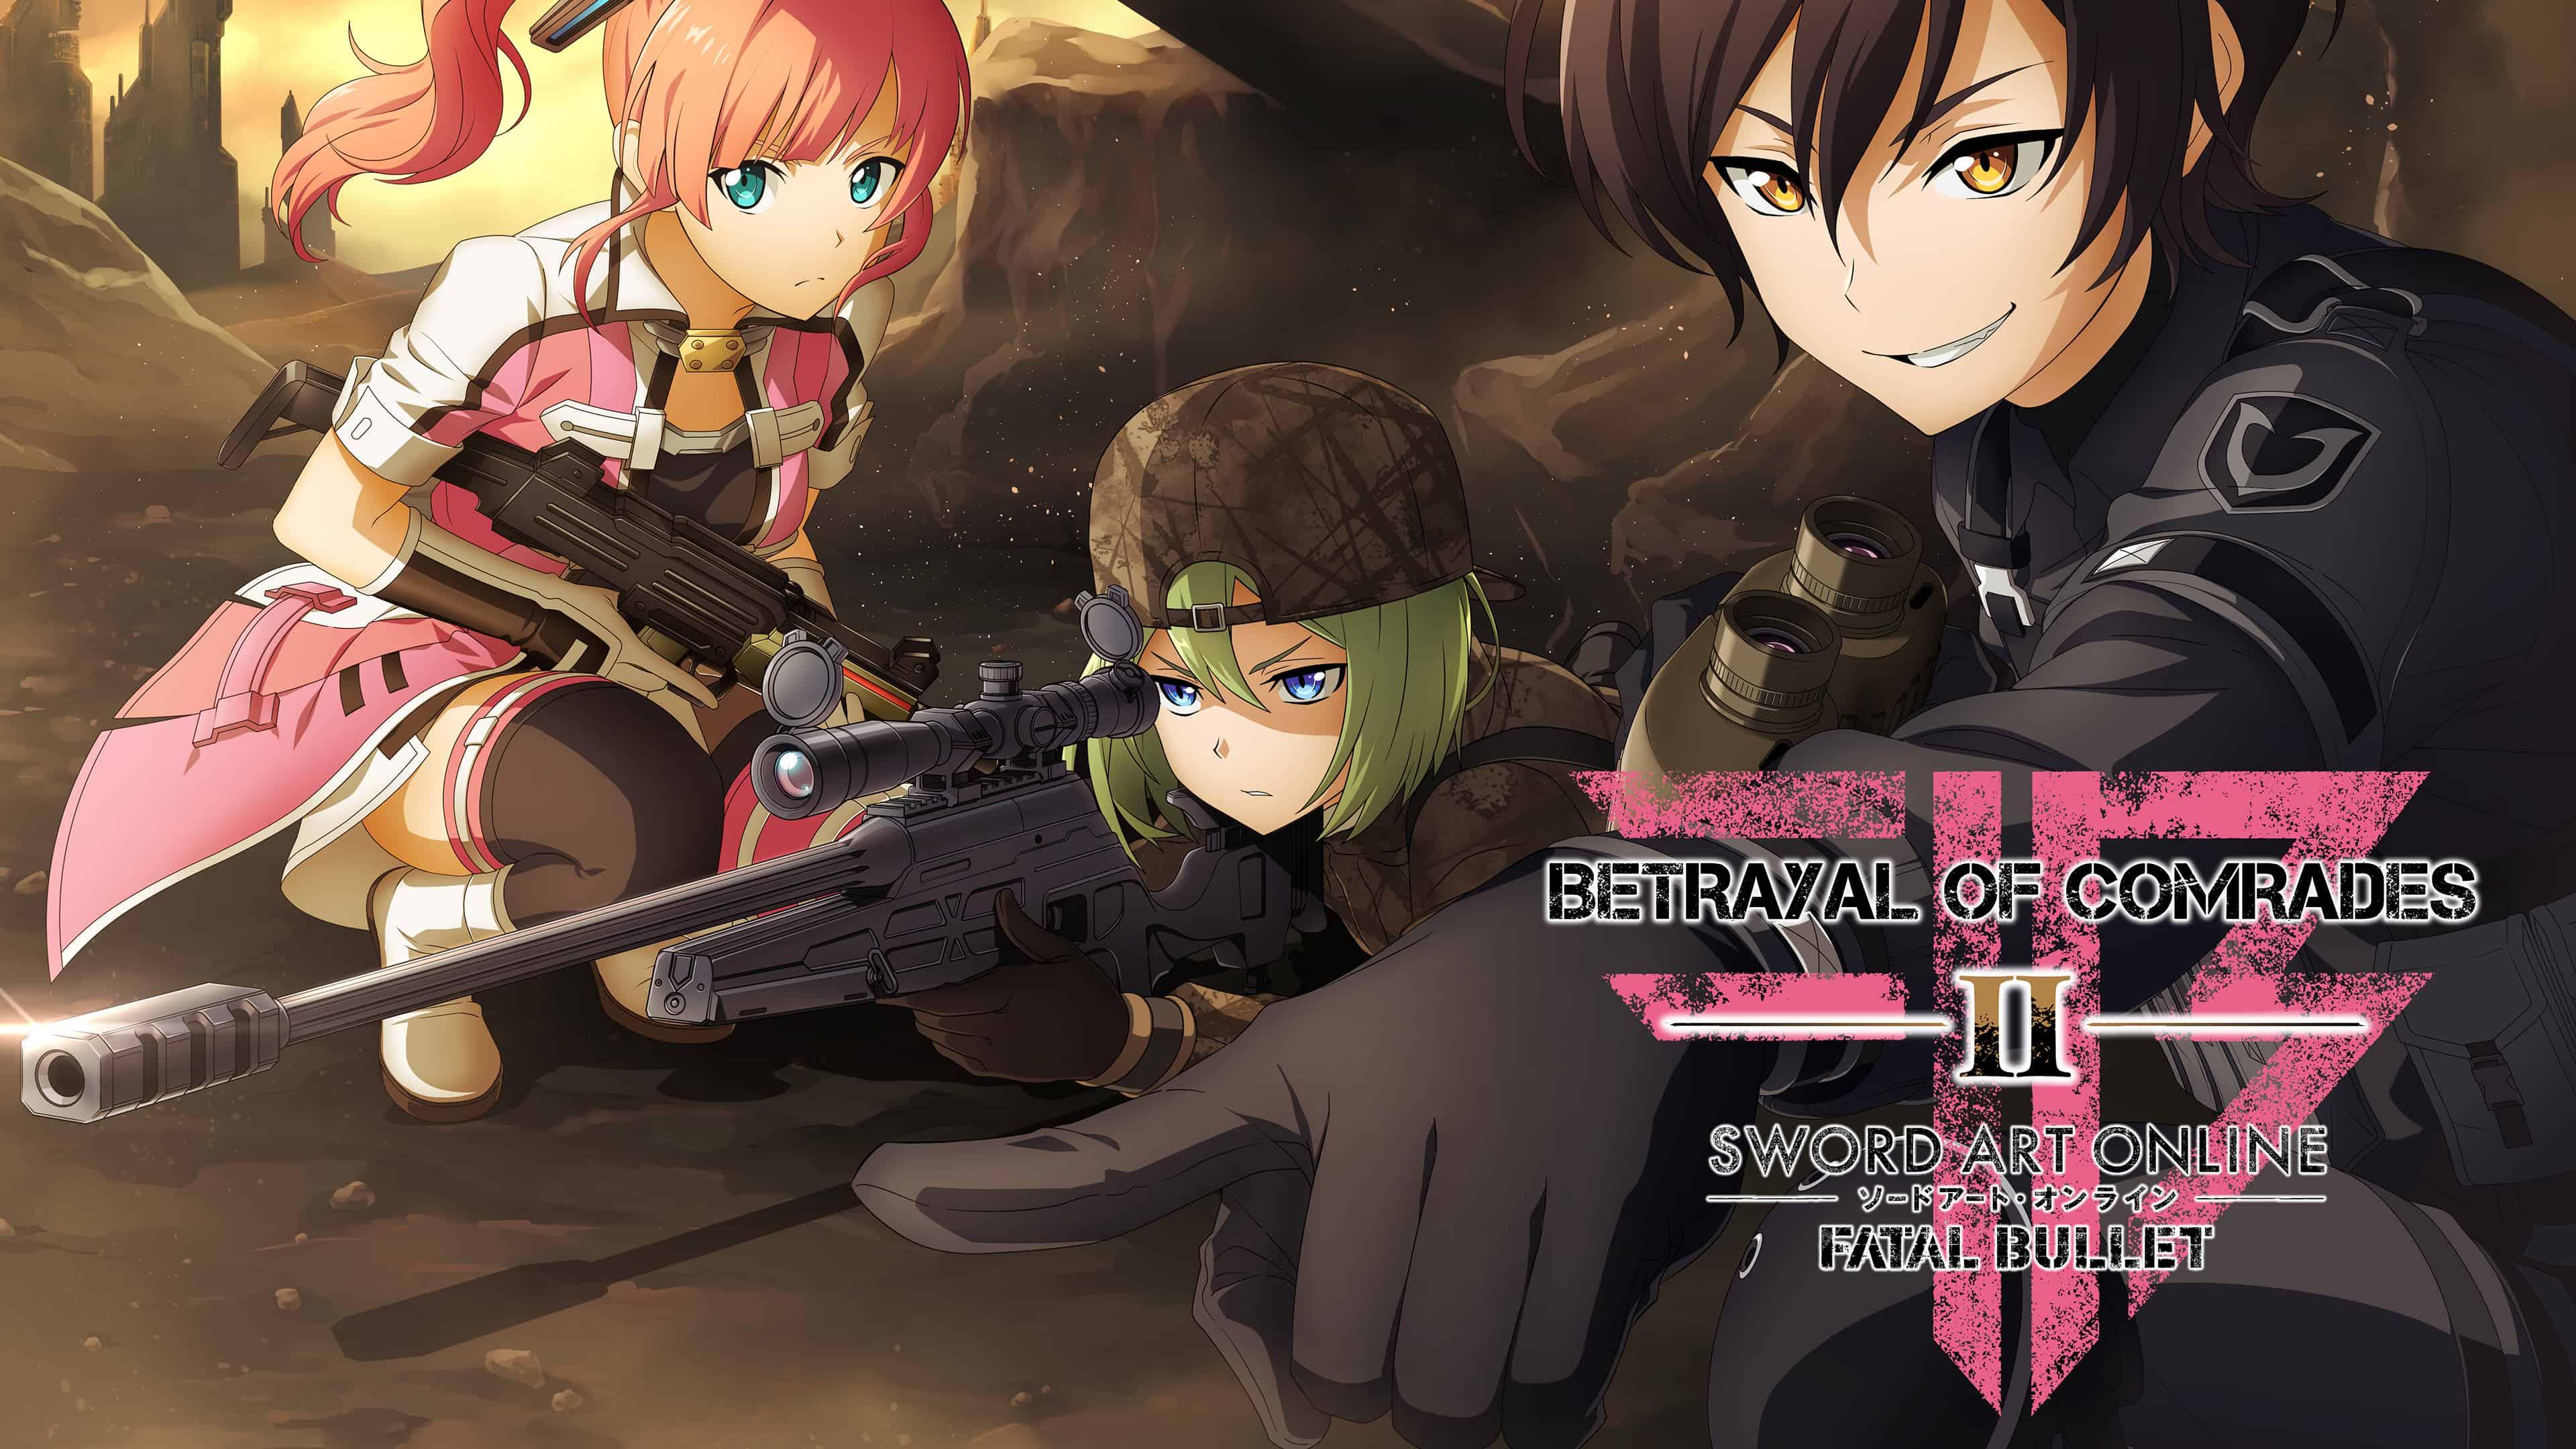 Anime Girl With Gun Double Monitor Wallpaper Sword Art Online Fatal Bullet Betrayal Of Comrades Uhd 4k